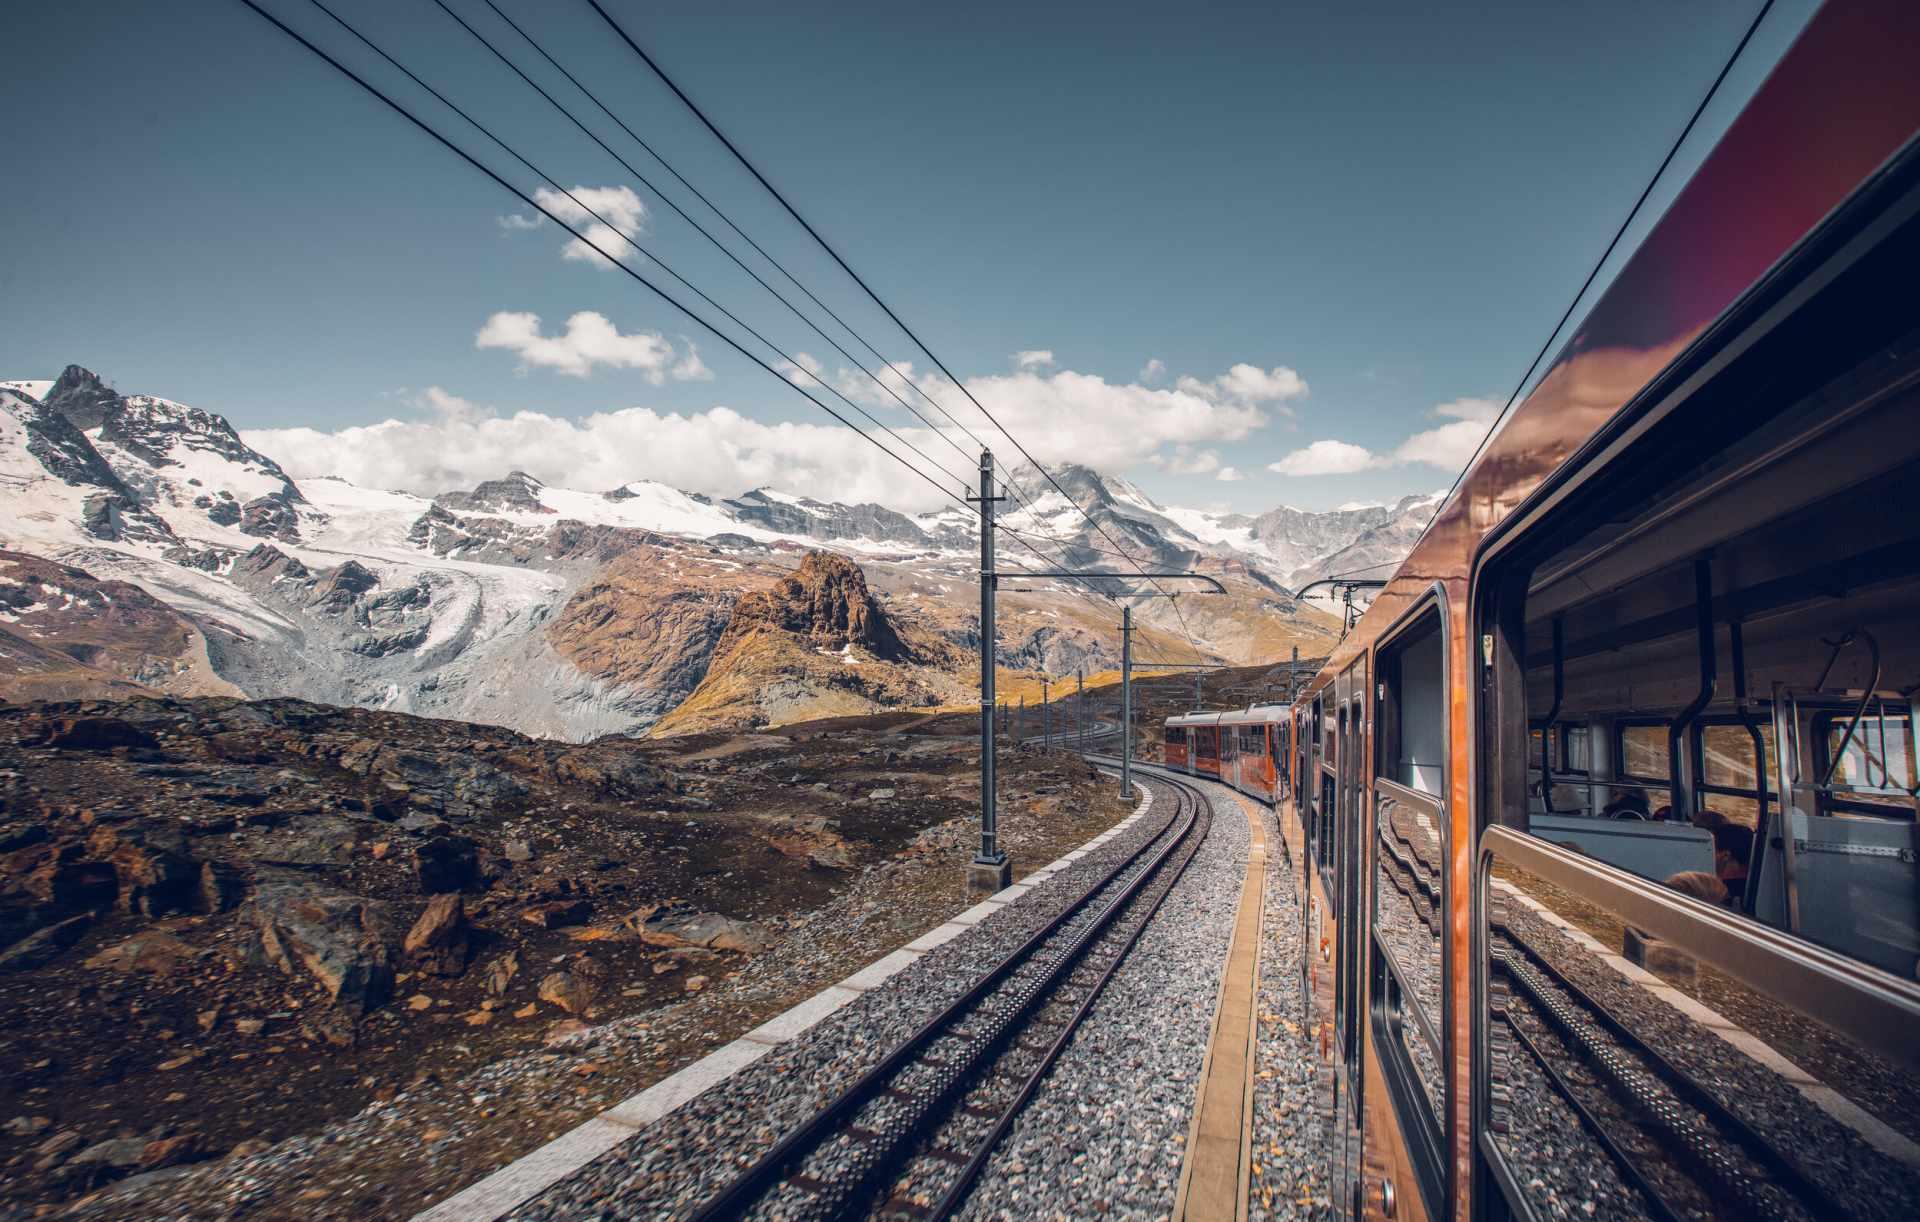 Gornergrat Bahn on the track at Rotenboden in summer